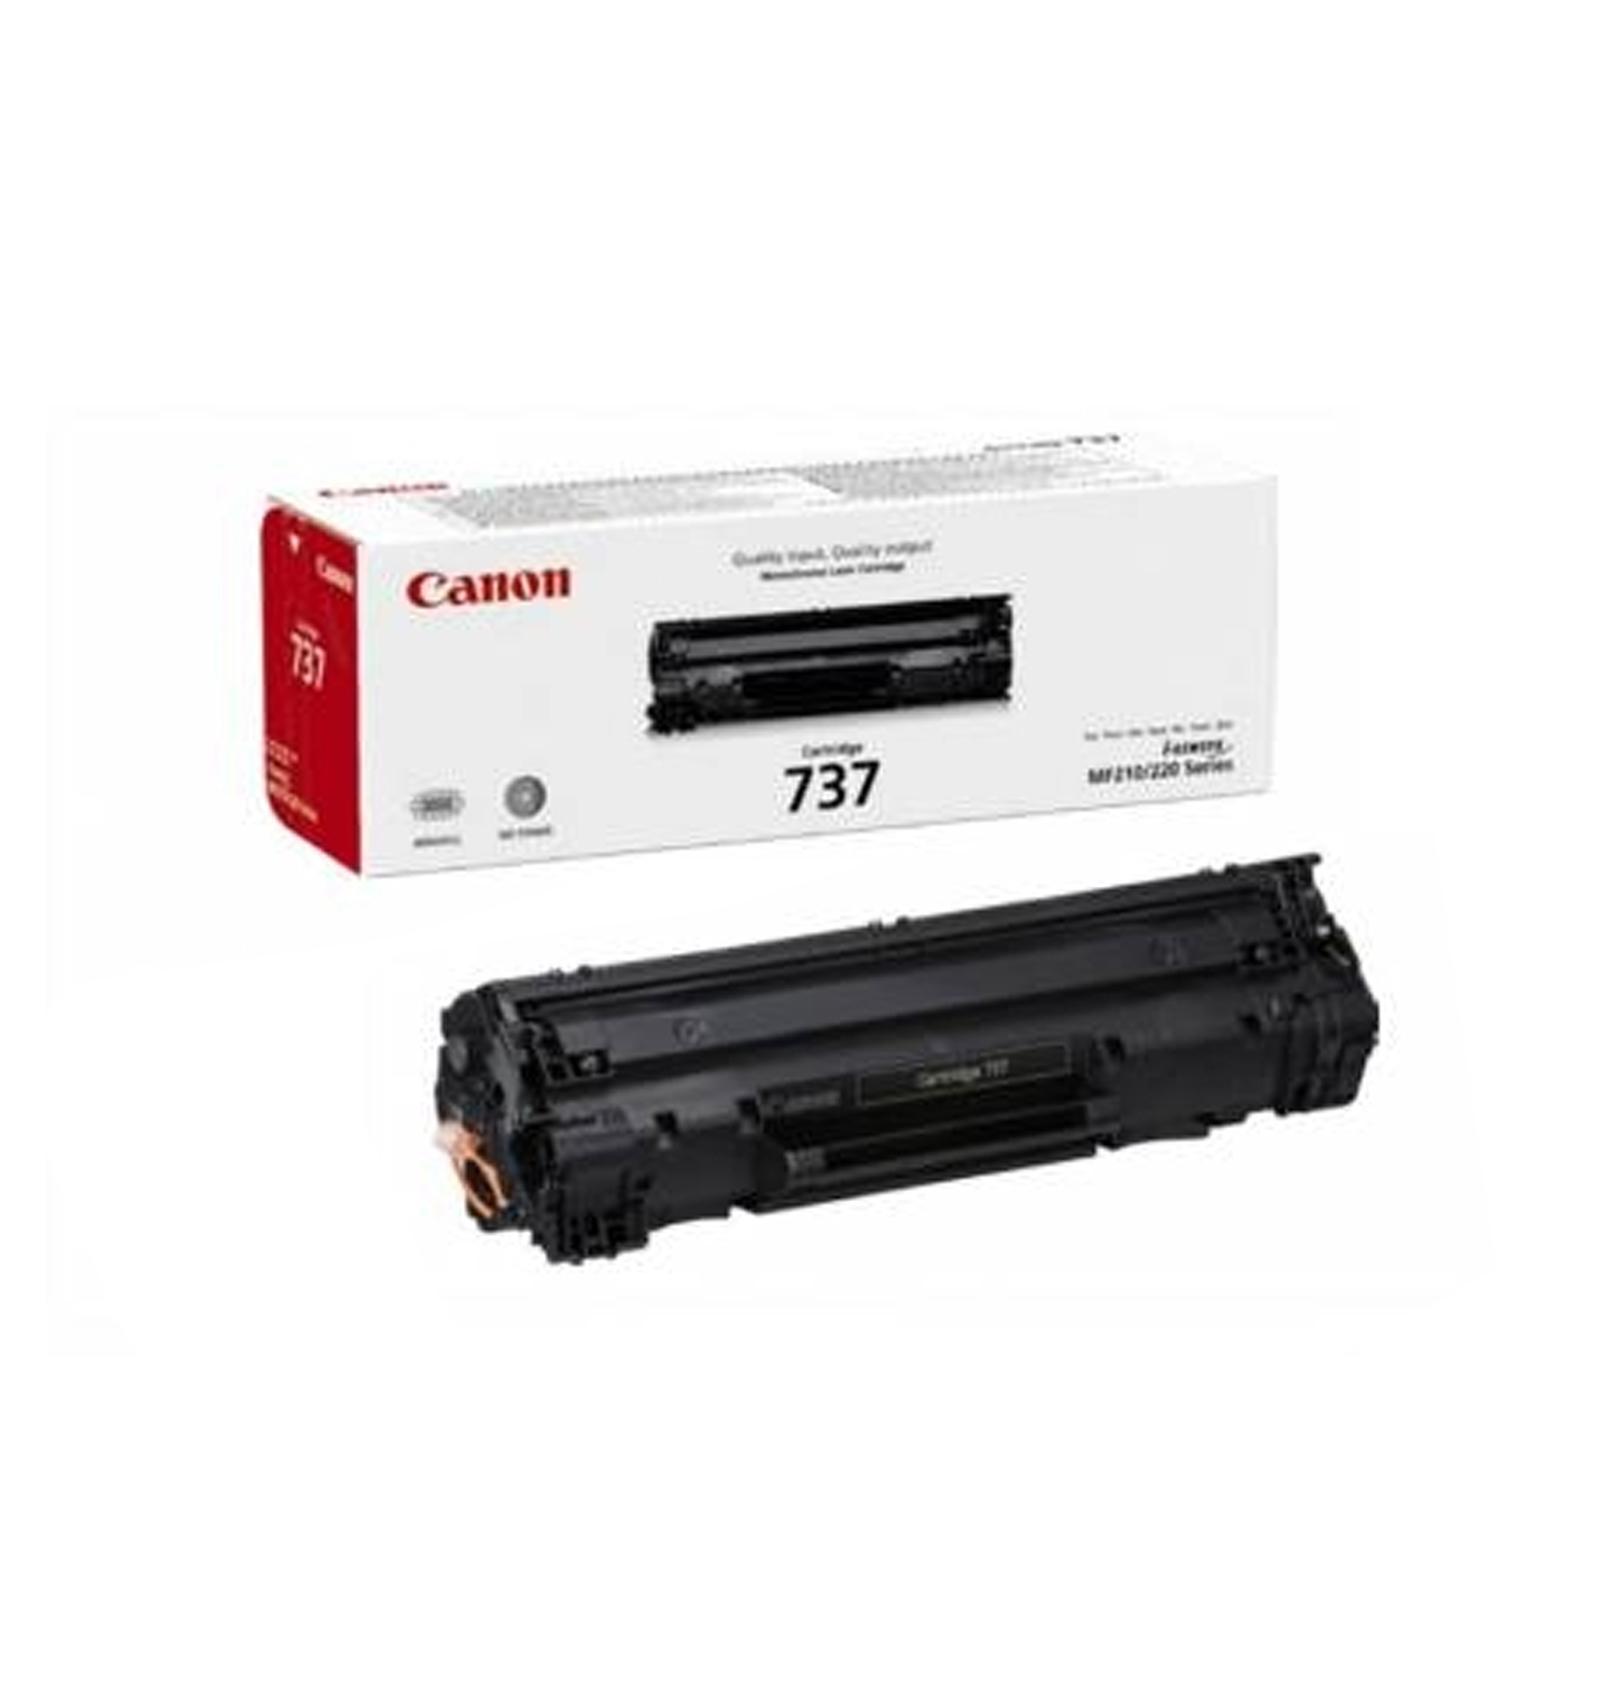 Canon 737 для MF211/212/216/217/226/229